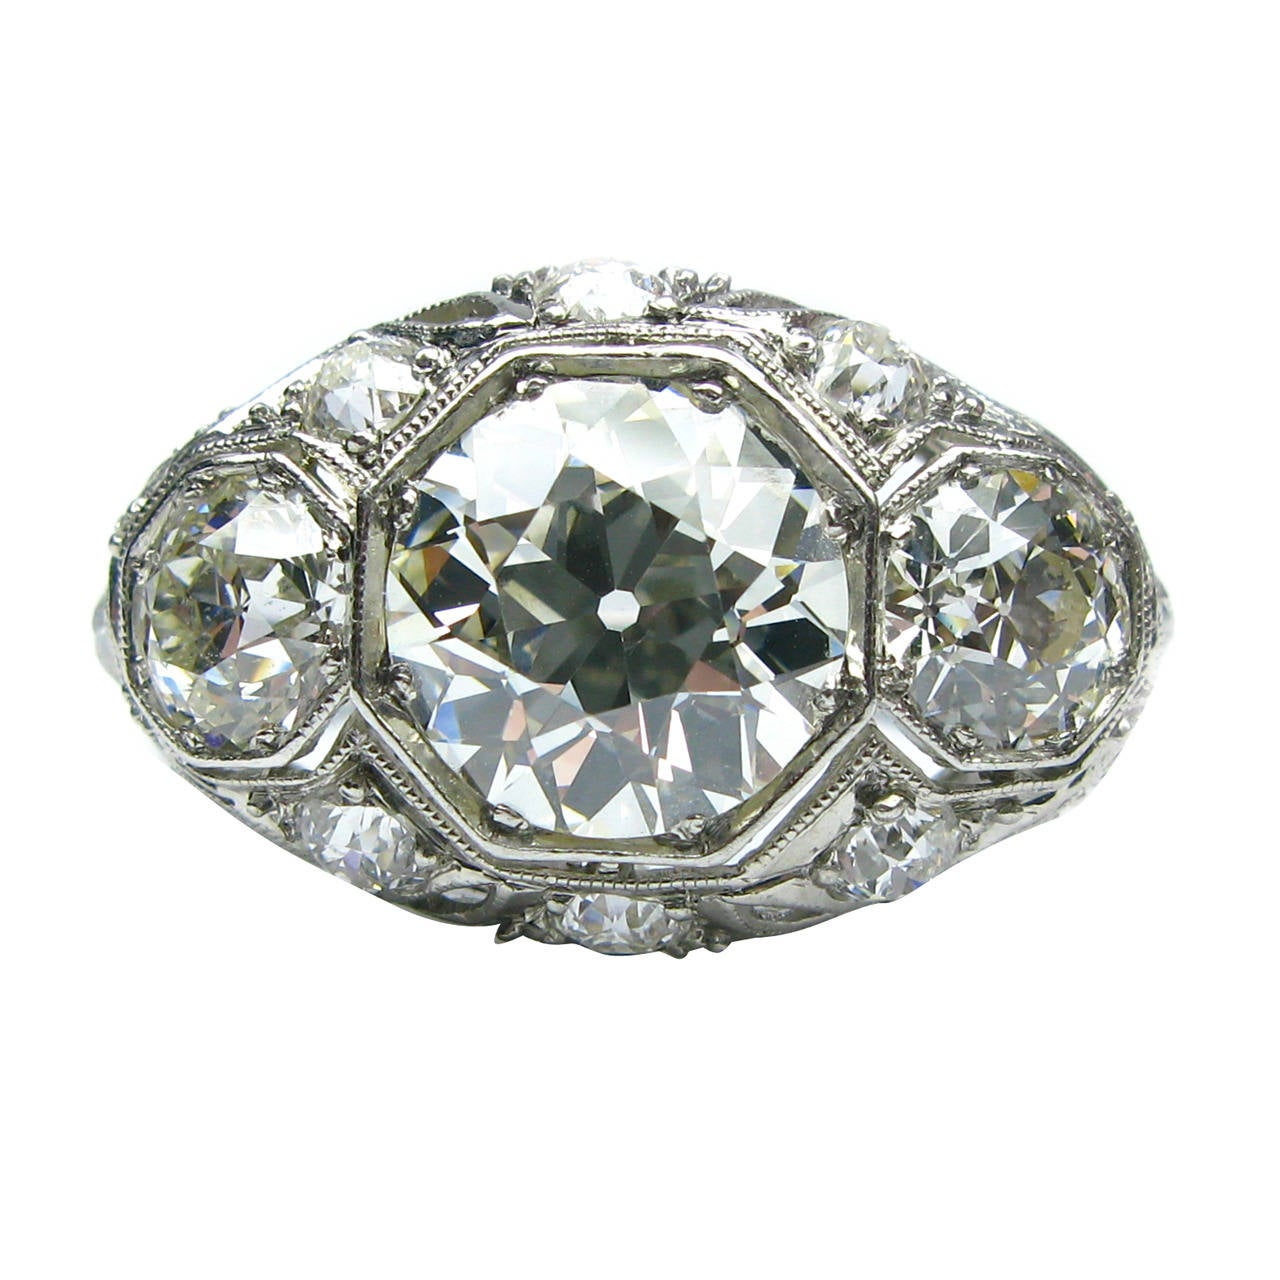 Stones Platinum: Art Deco Diamond Platinum Three Stone Ring For Sale At 1stdibs